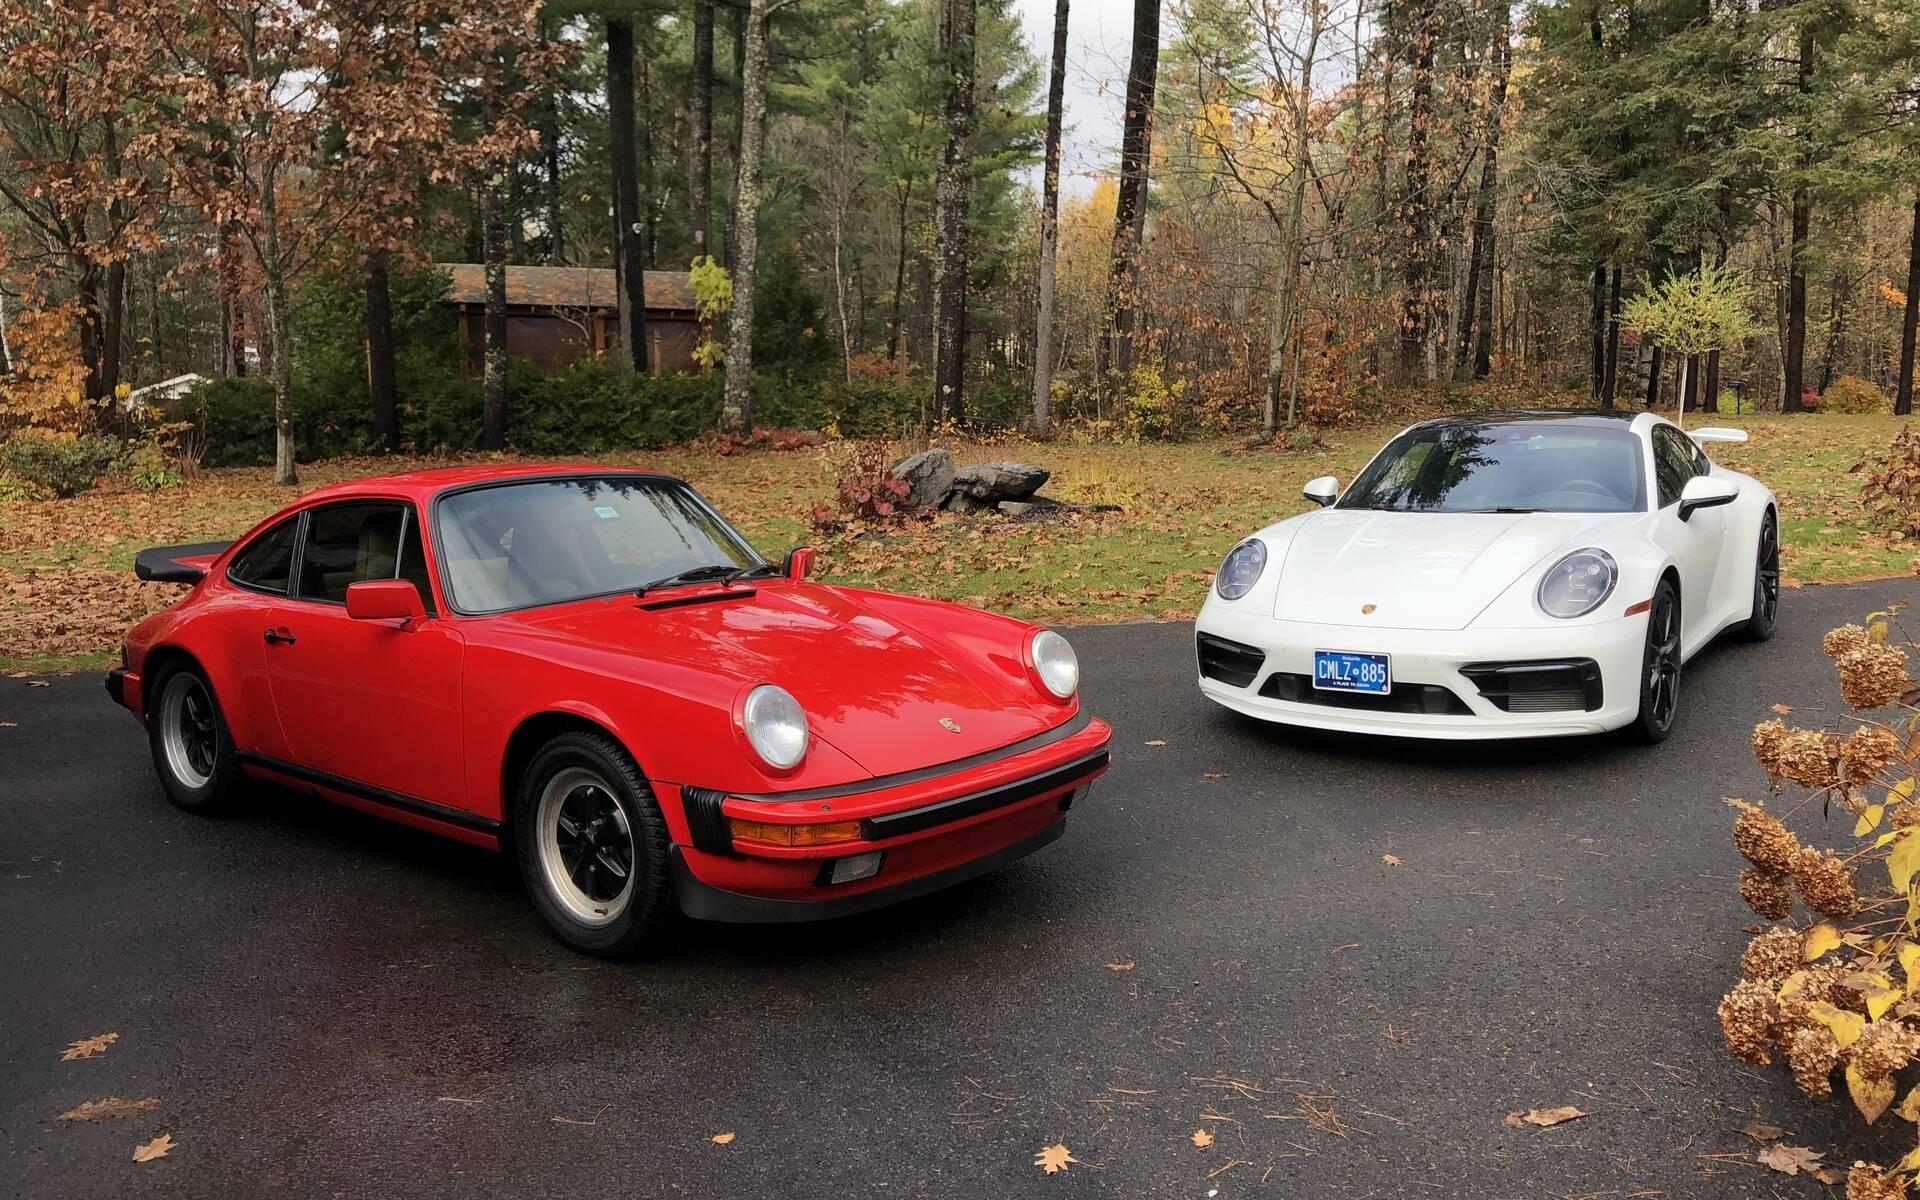 <p>Porsche 911 Carrera 3.2&nbsp;1985, Porsche 911 Carrera S 2020</p>